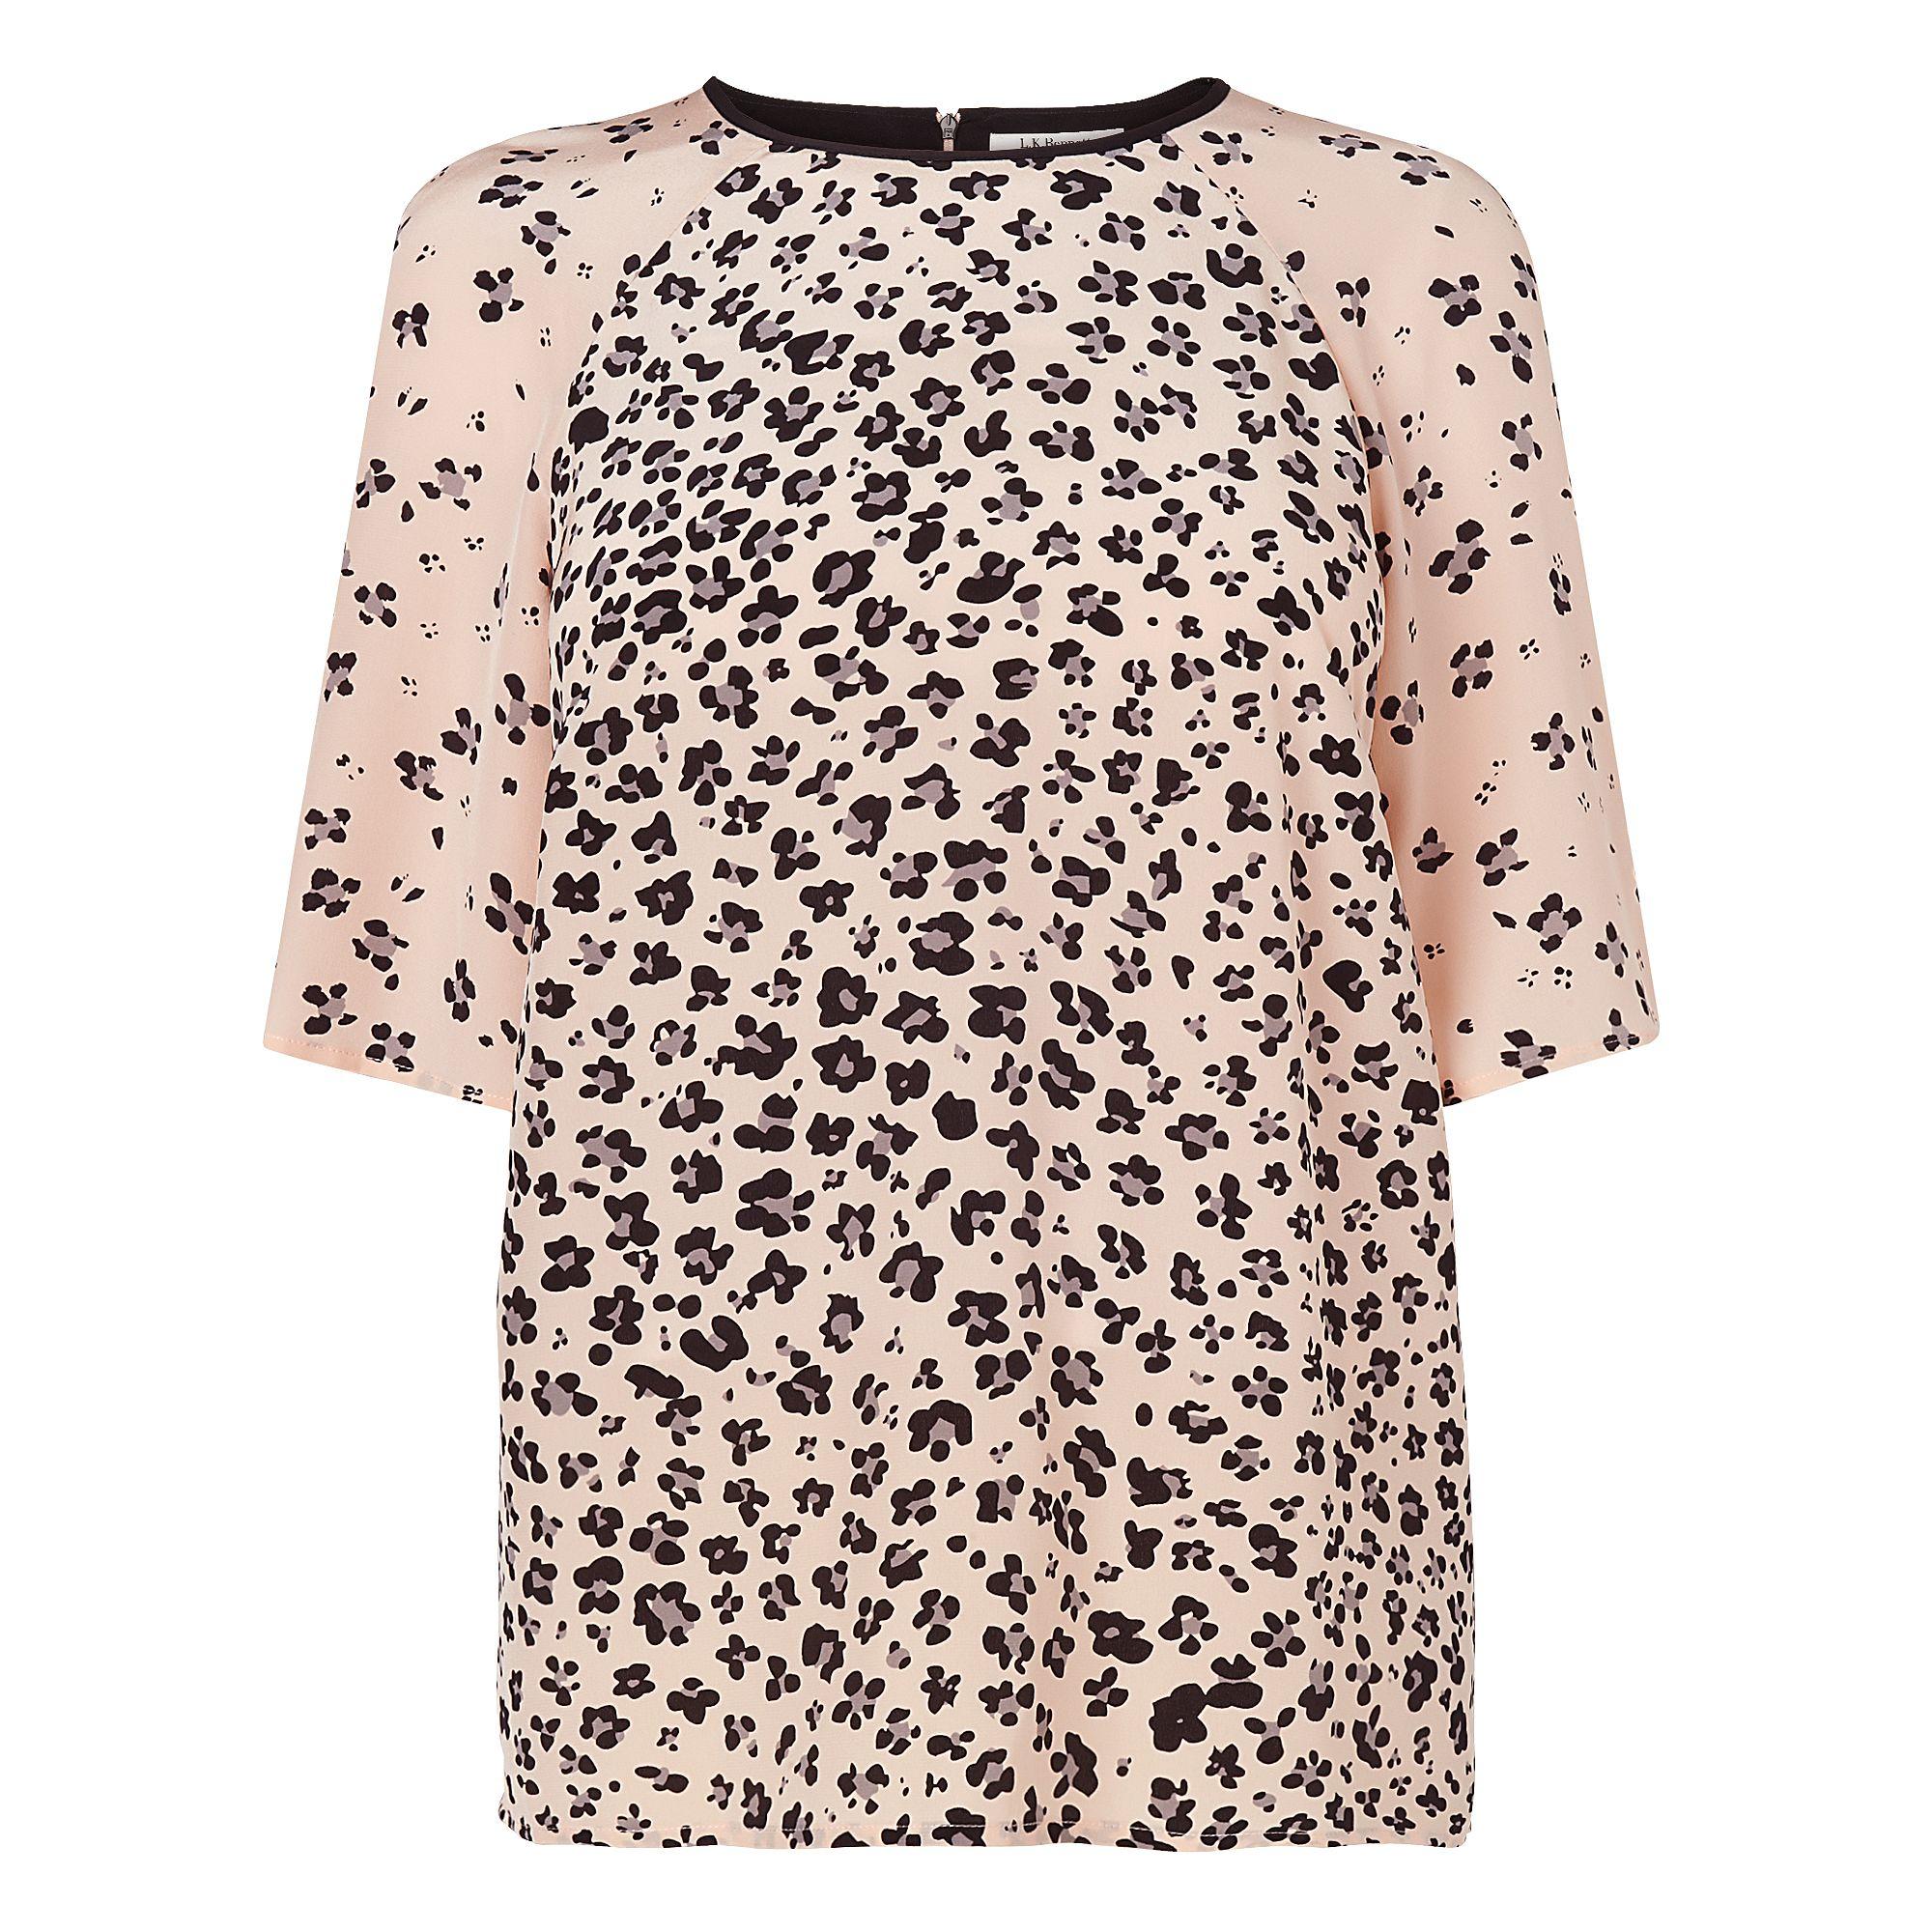 L.K.Bennett Blossom Print Silk T-Shirt in Pink